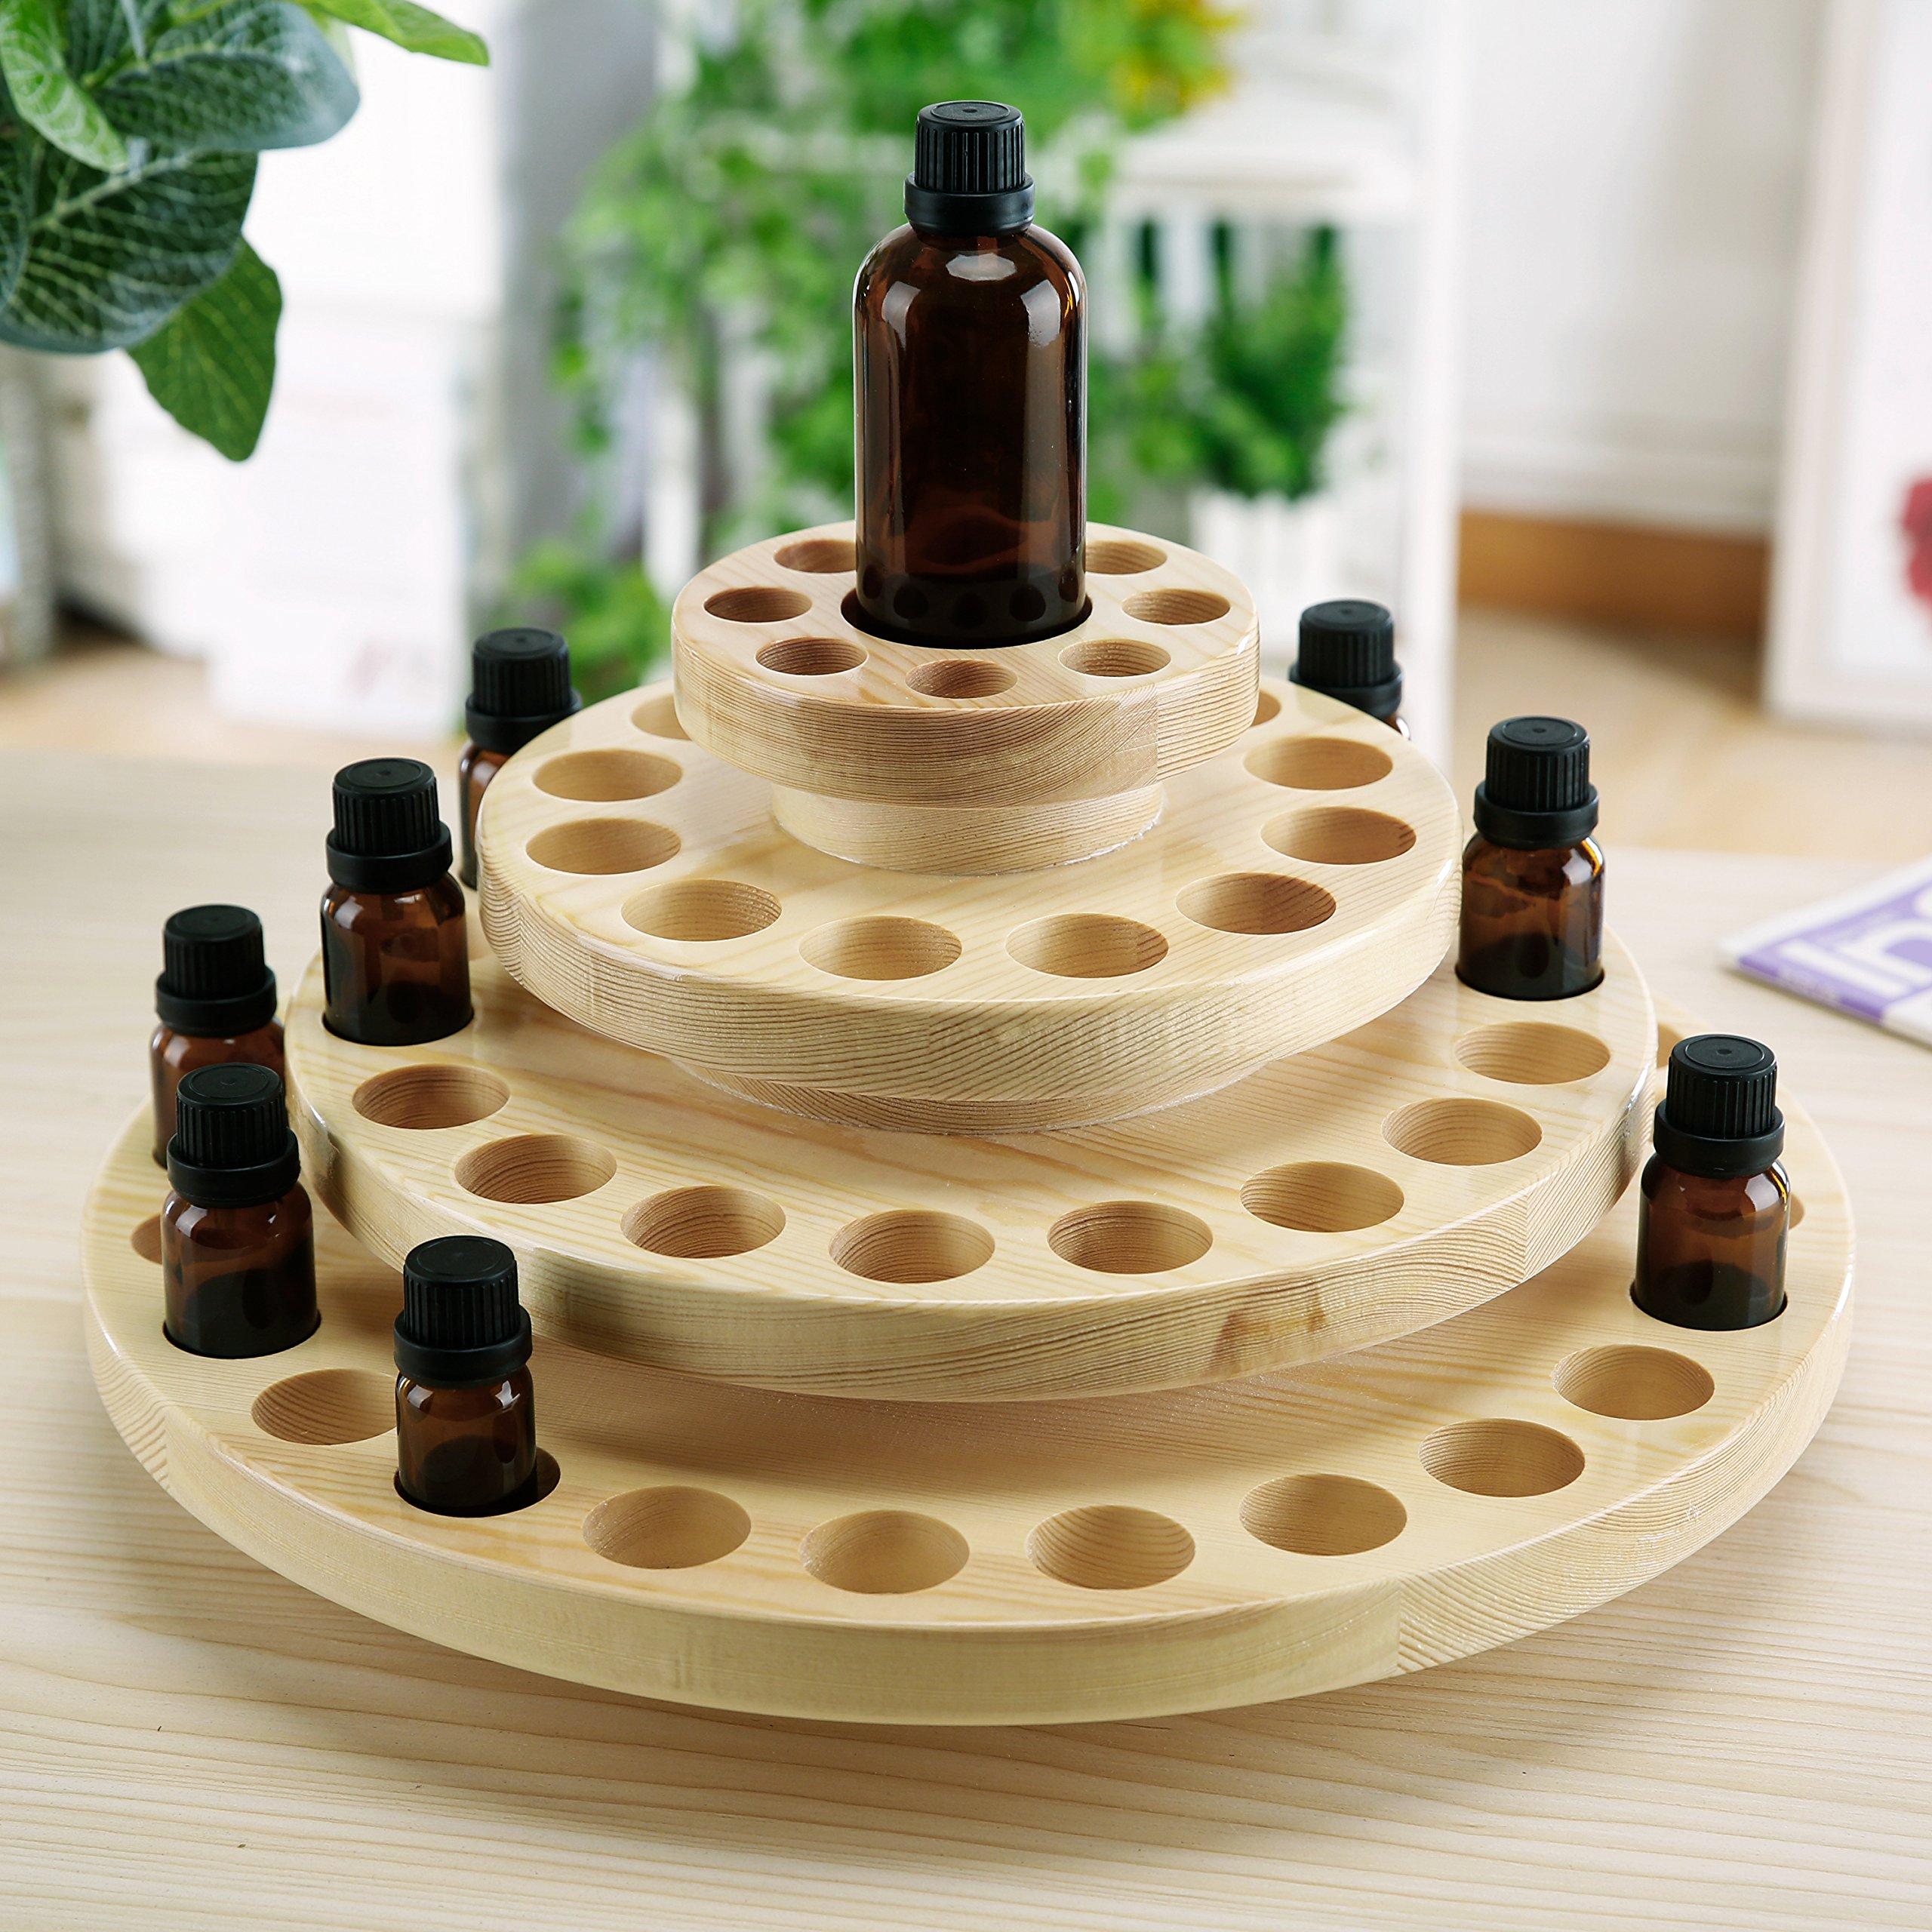 4 Tier Natural Wood Round Rotating Essential Oil Bottles Storage Display Rack